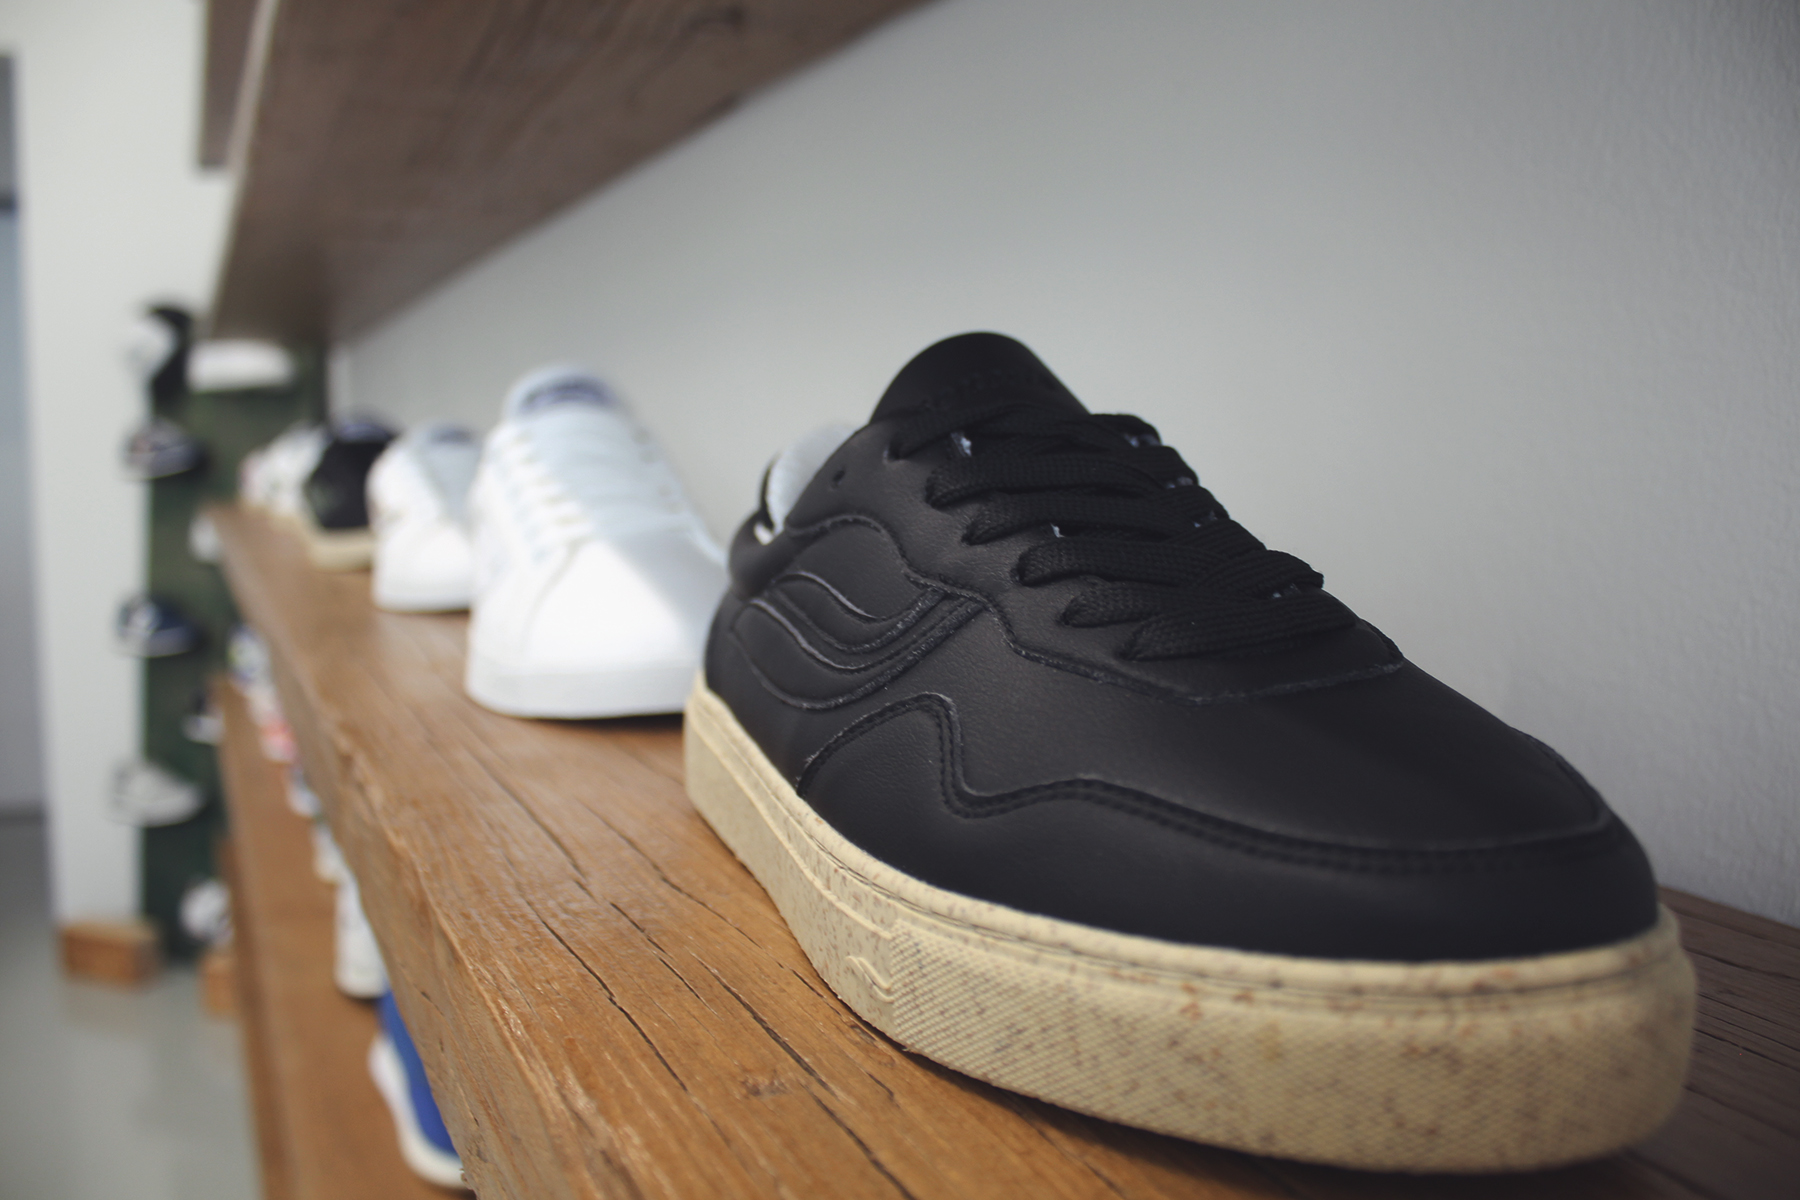 sneaker unplugged laden koeln 4 artikel – ©Sarah Kleiss